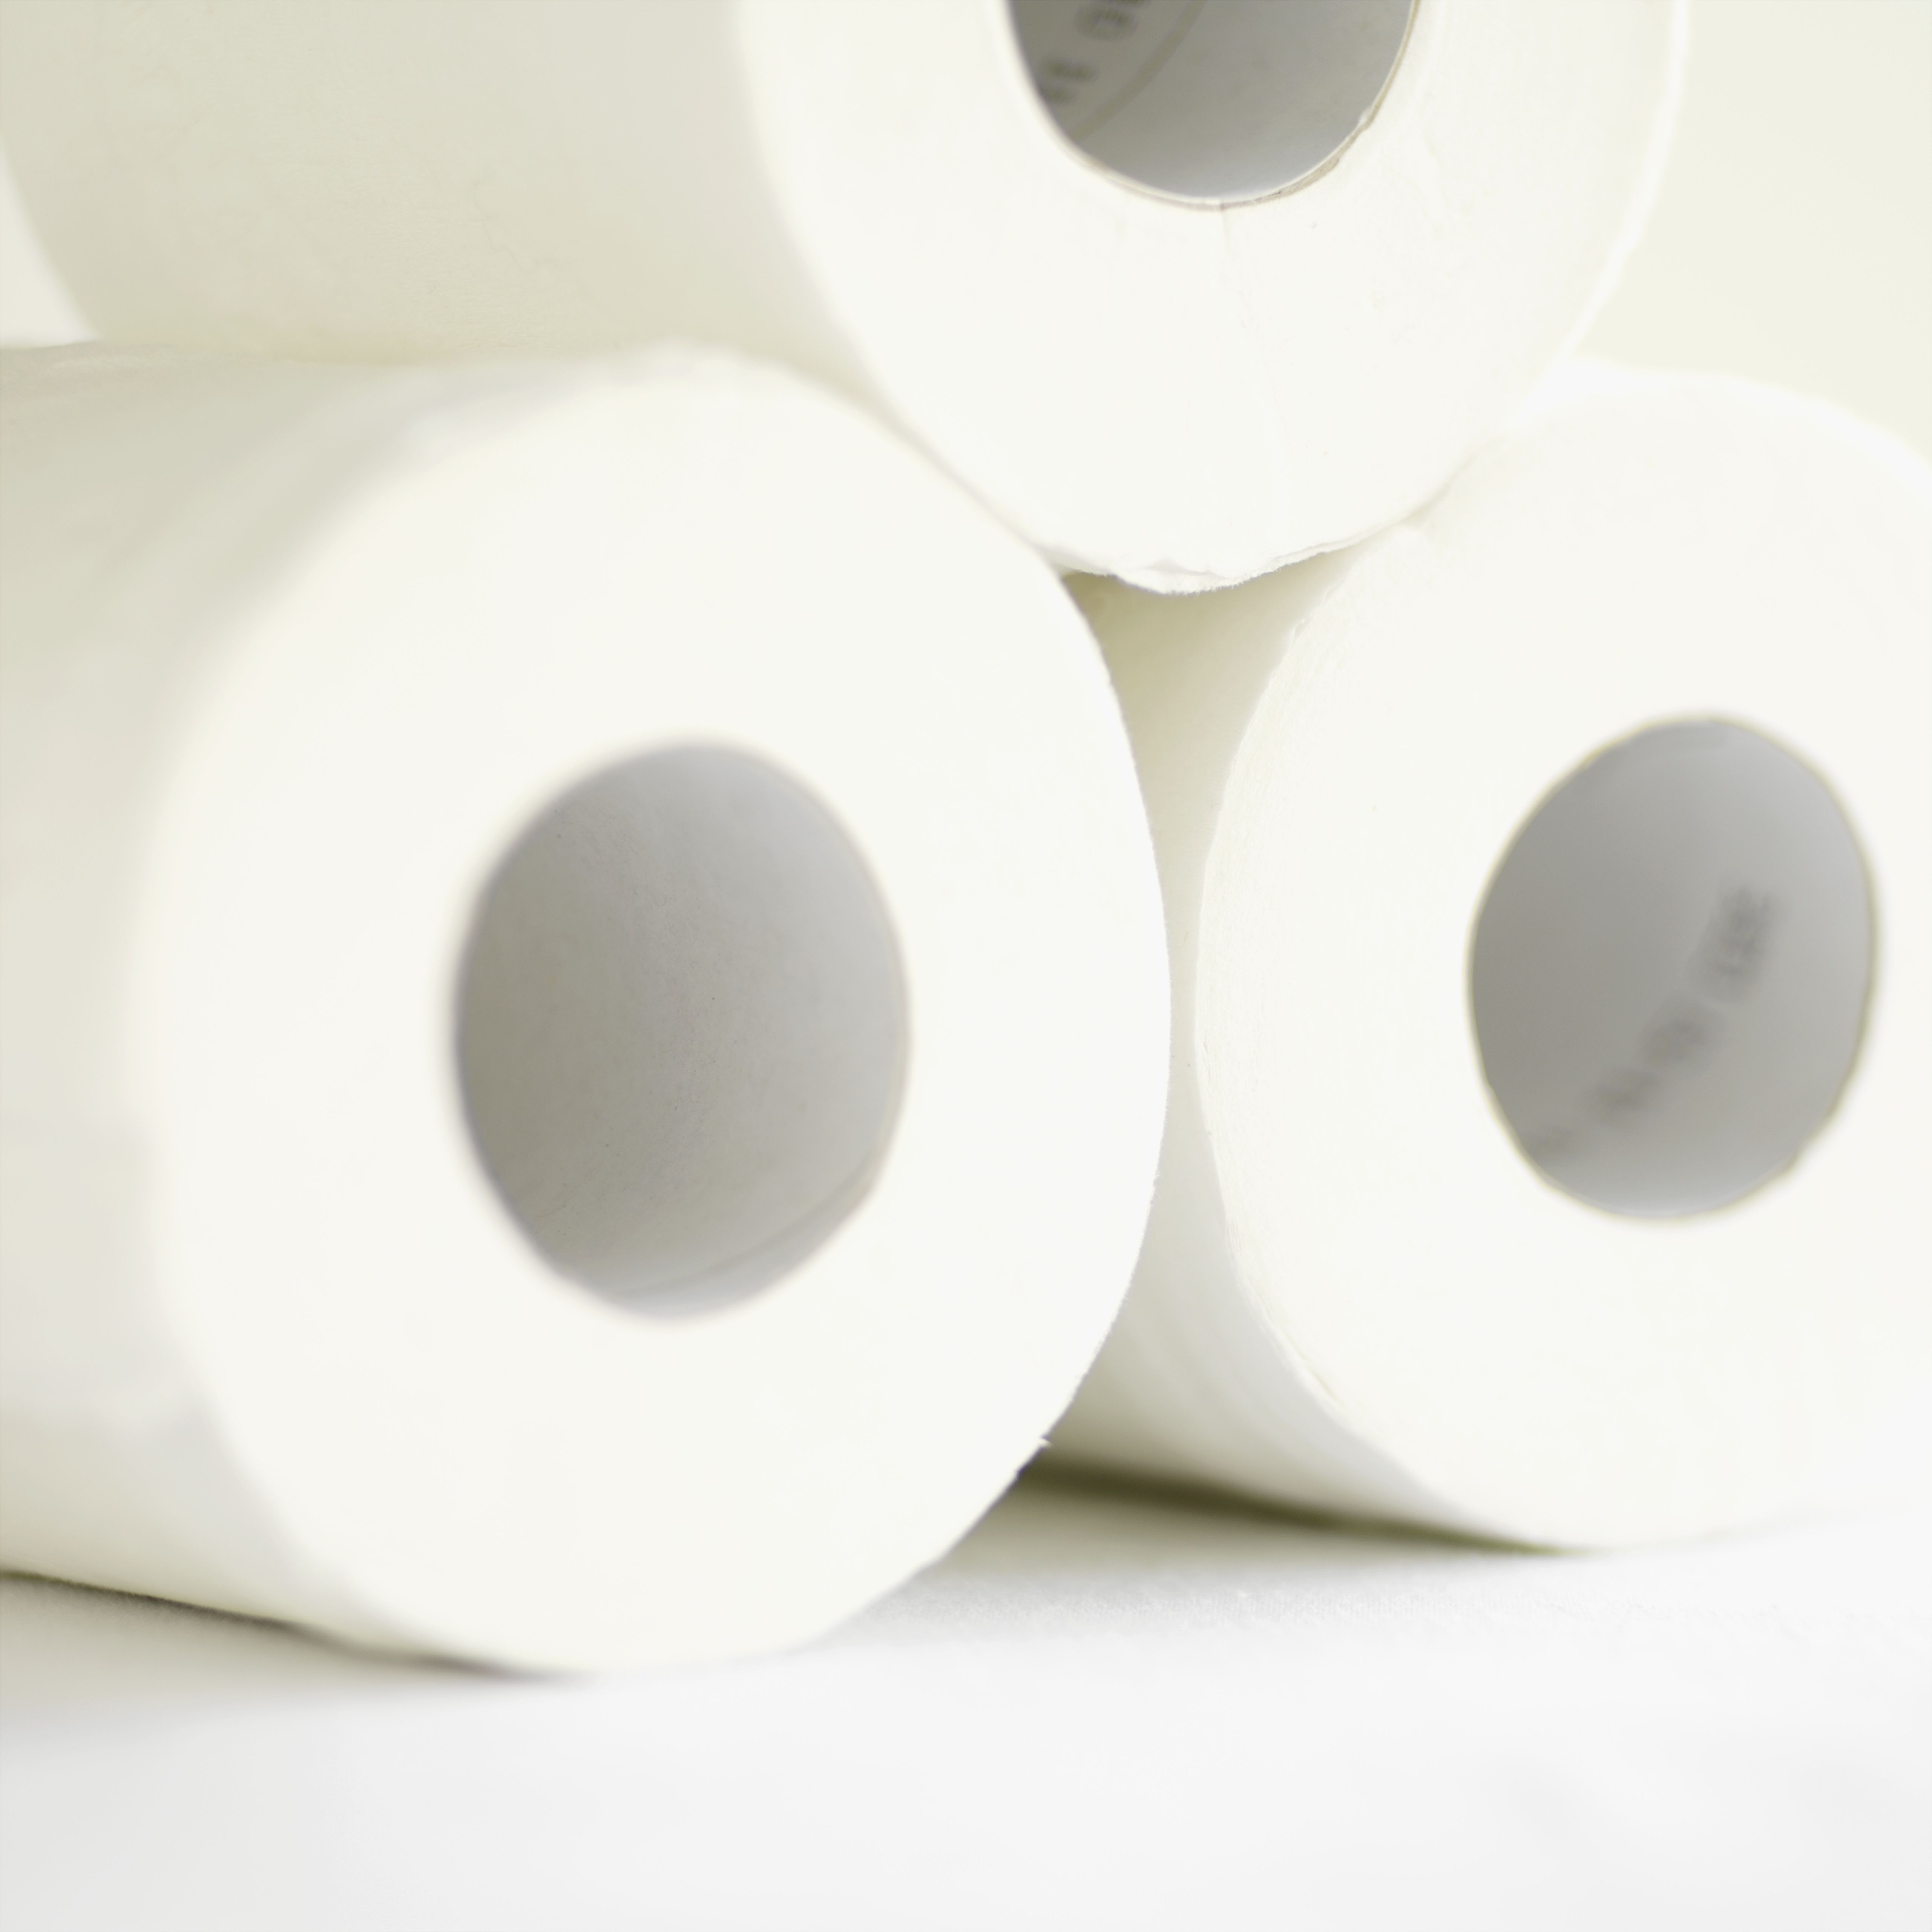 Toilet Paper Icebreaker Games